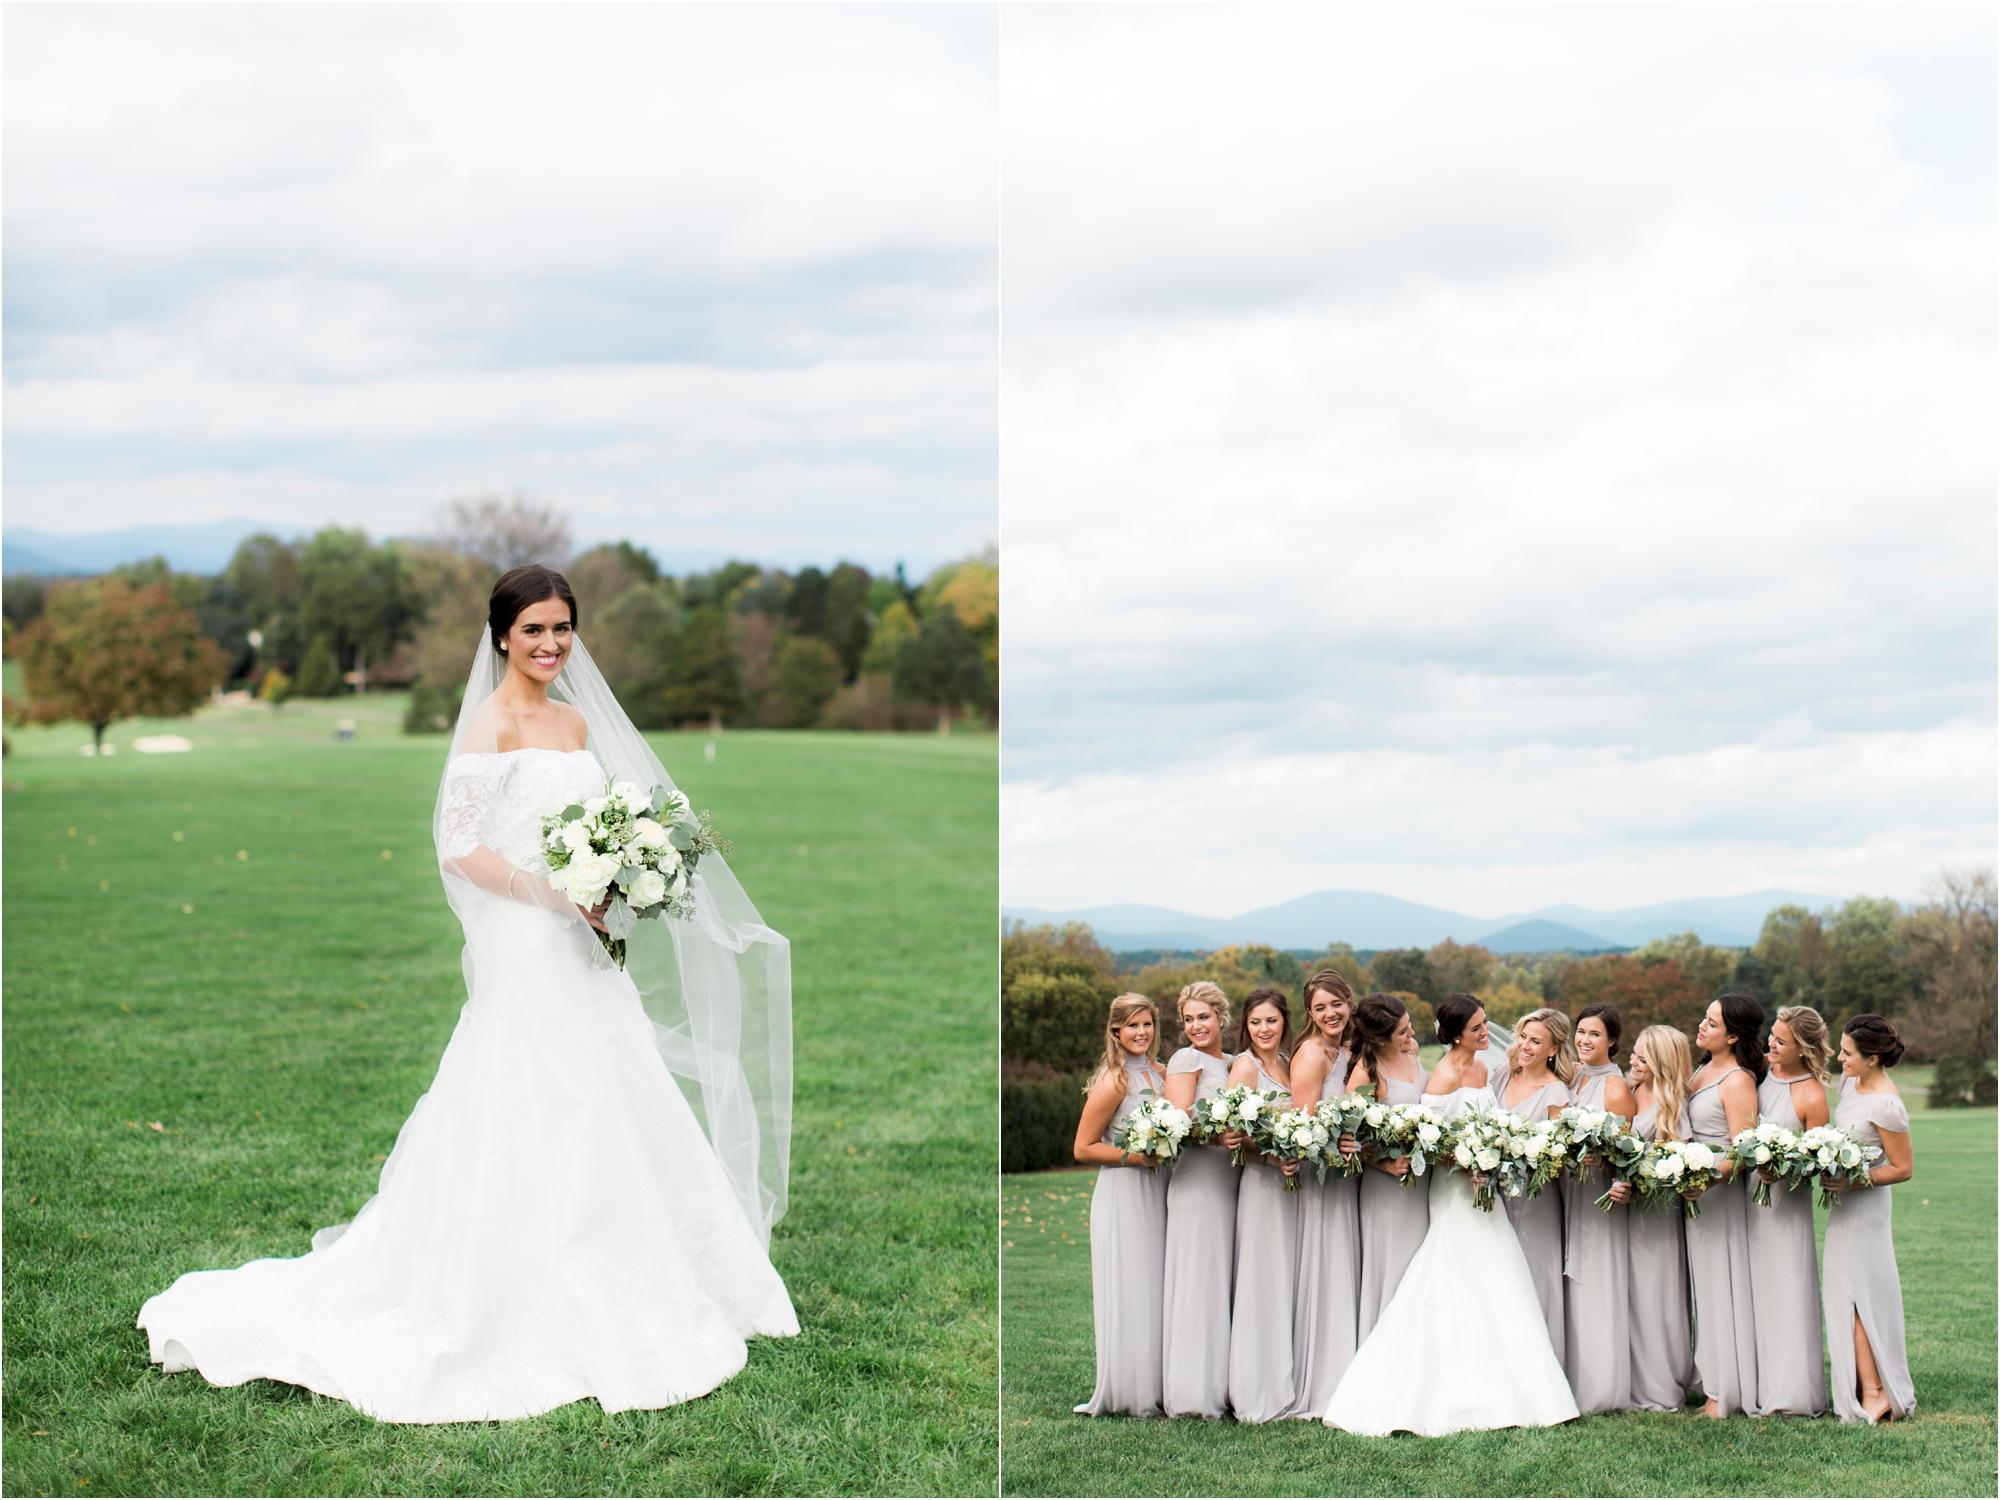 claire-thomas-farmington-country-club-charlottesville-virginia-wedding-photos_0015.jpg